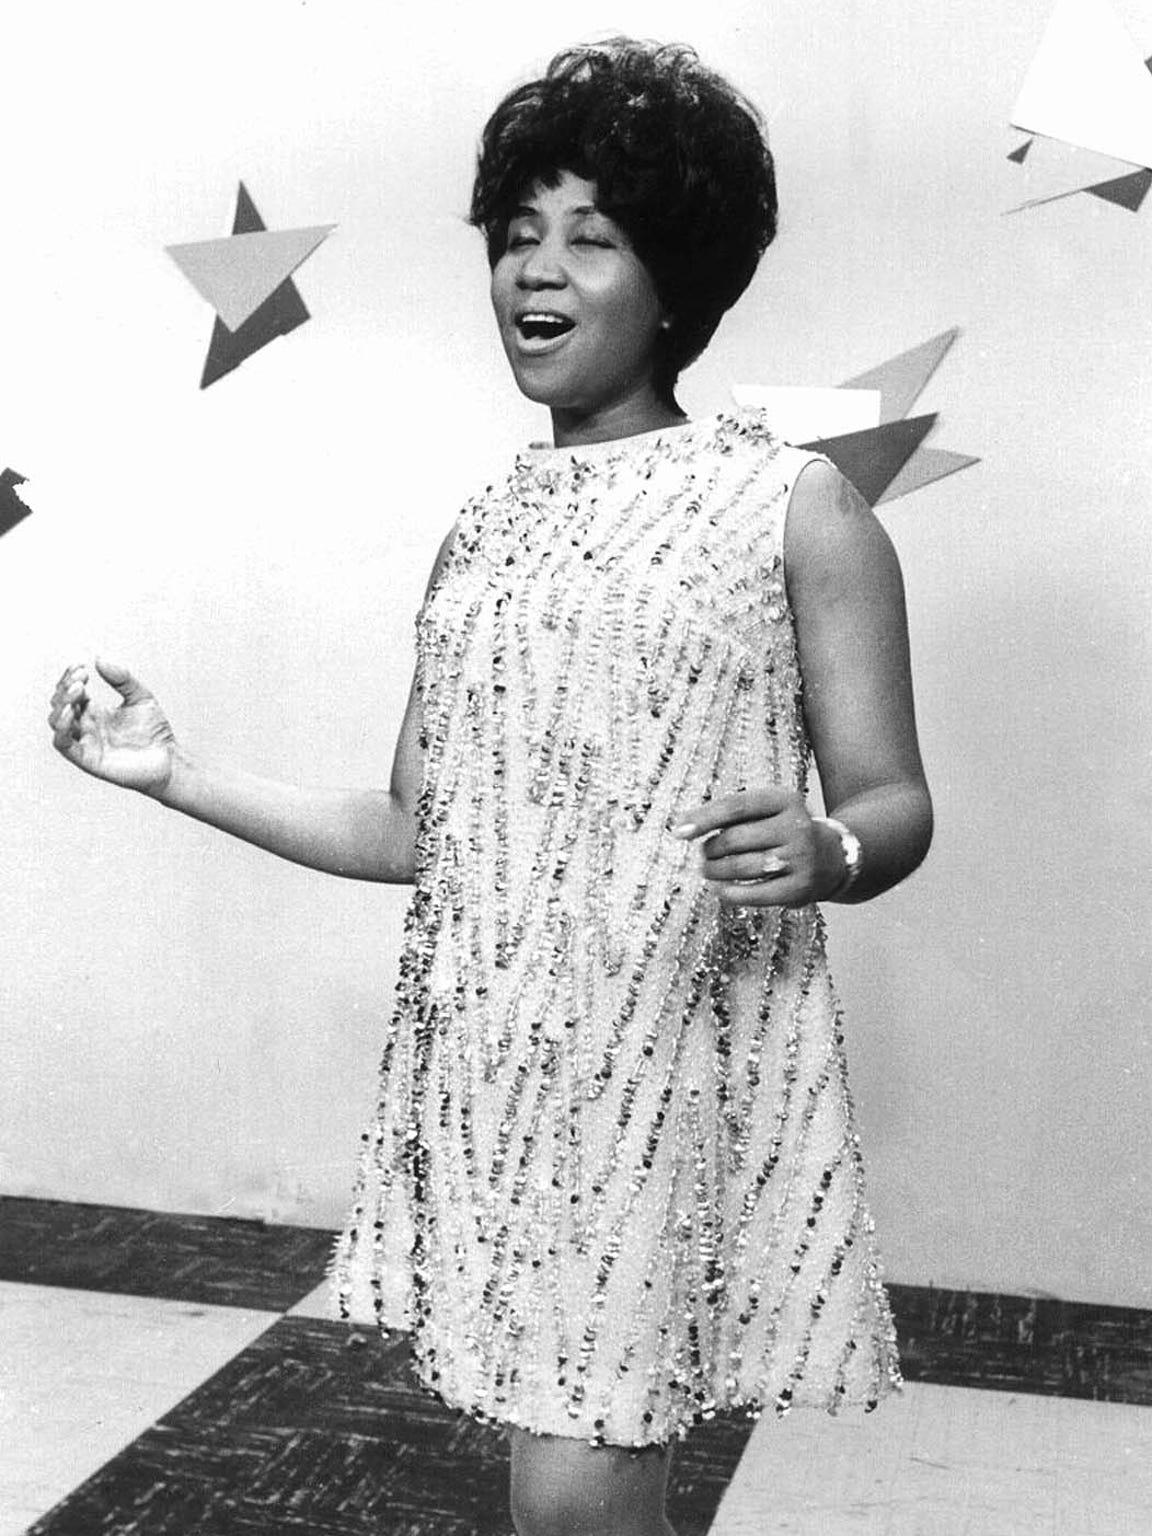 Aretha Franklin's pop music recording career began